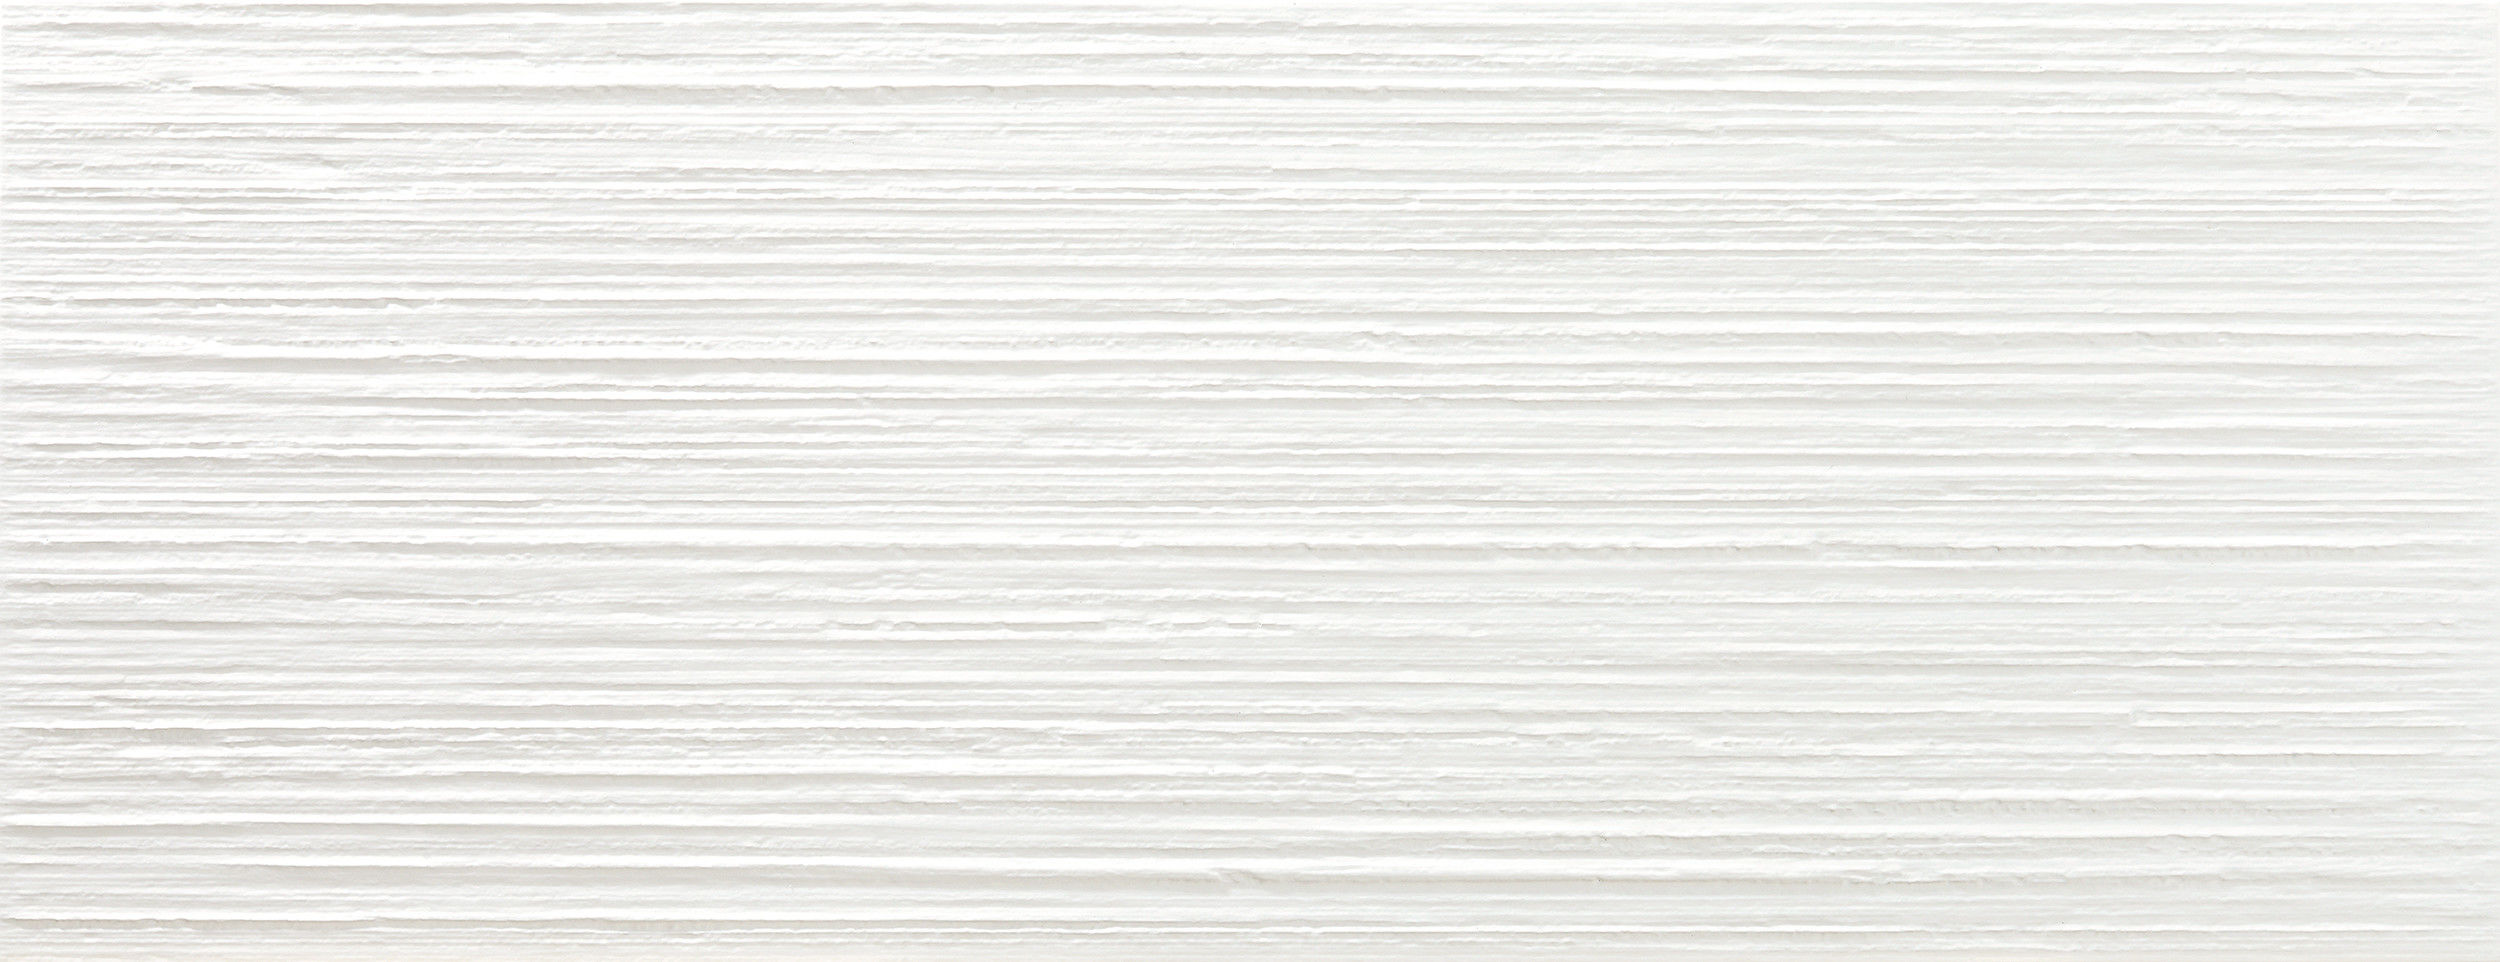 Clarity Hills Blanco Matt Slimrect 25x65 płytki ścienne